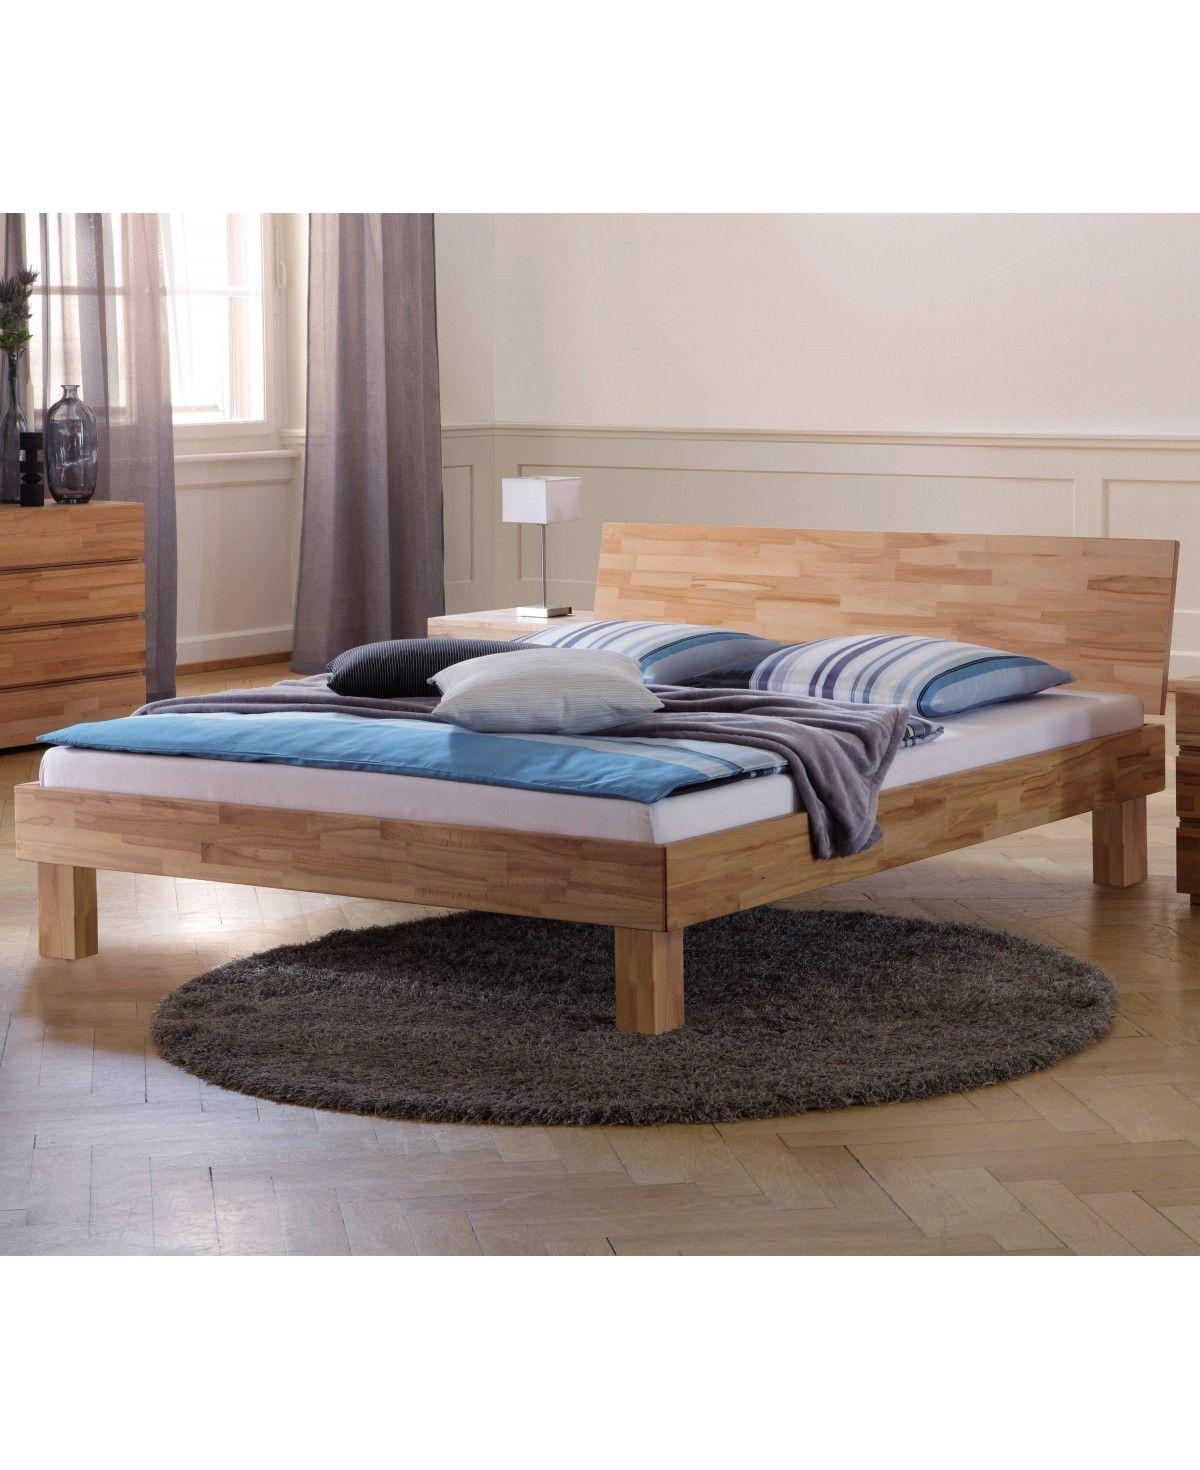 Hasena Wood Line Bett Kernbuche Kopfteil Varus Fusse Cantu 20 140x220